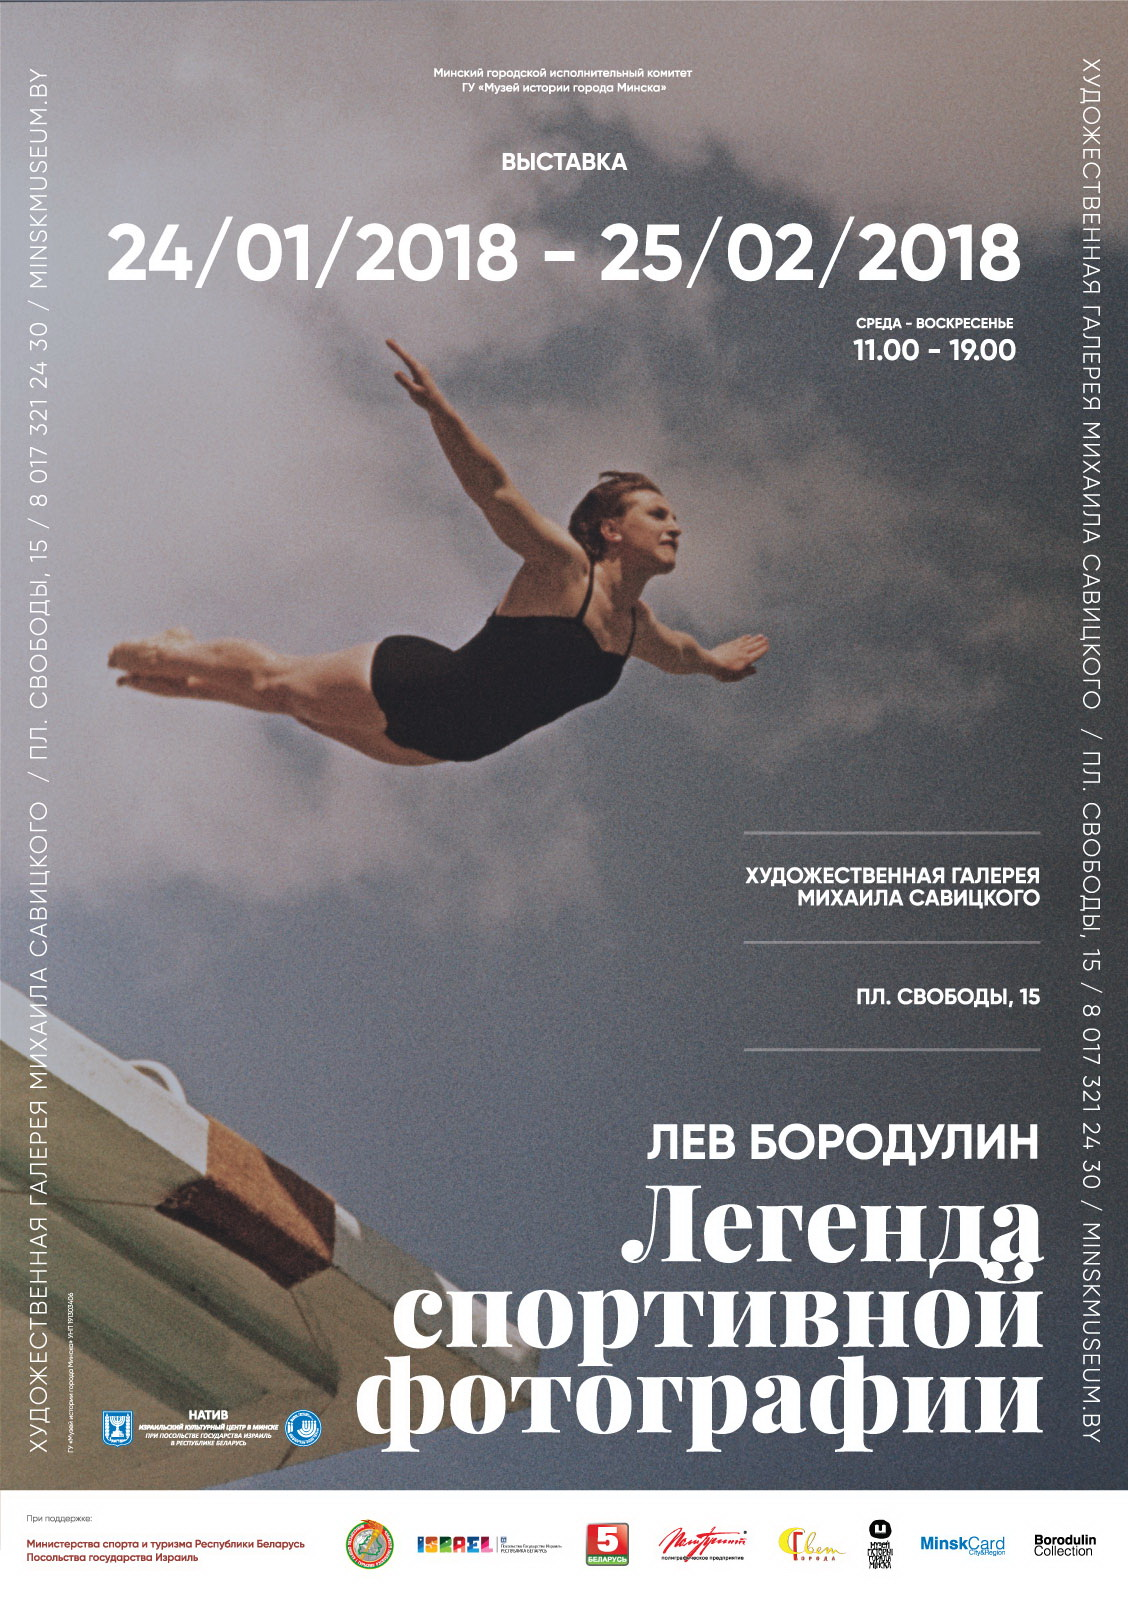 выставка спортивного фотографа Льва Бородулина